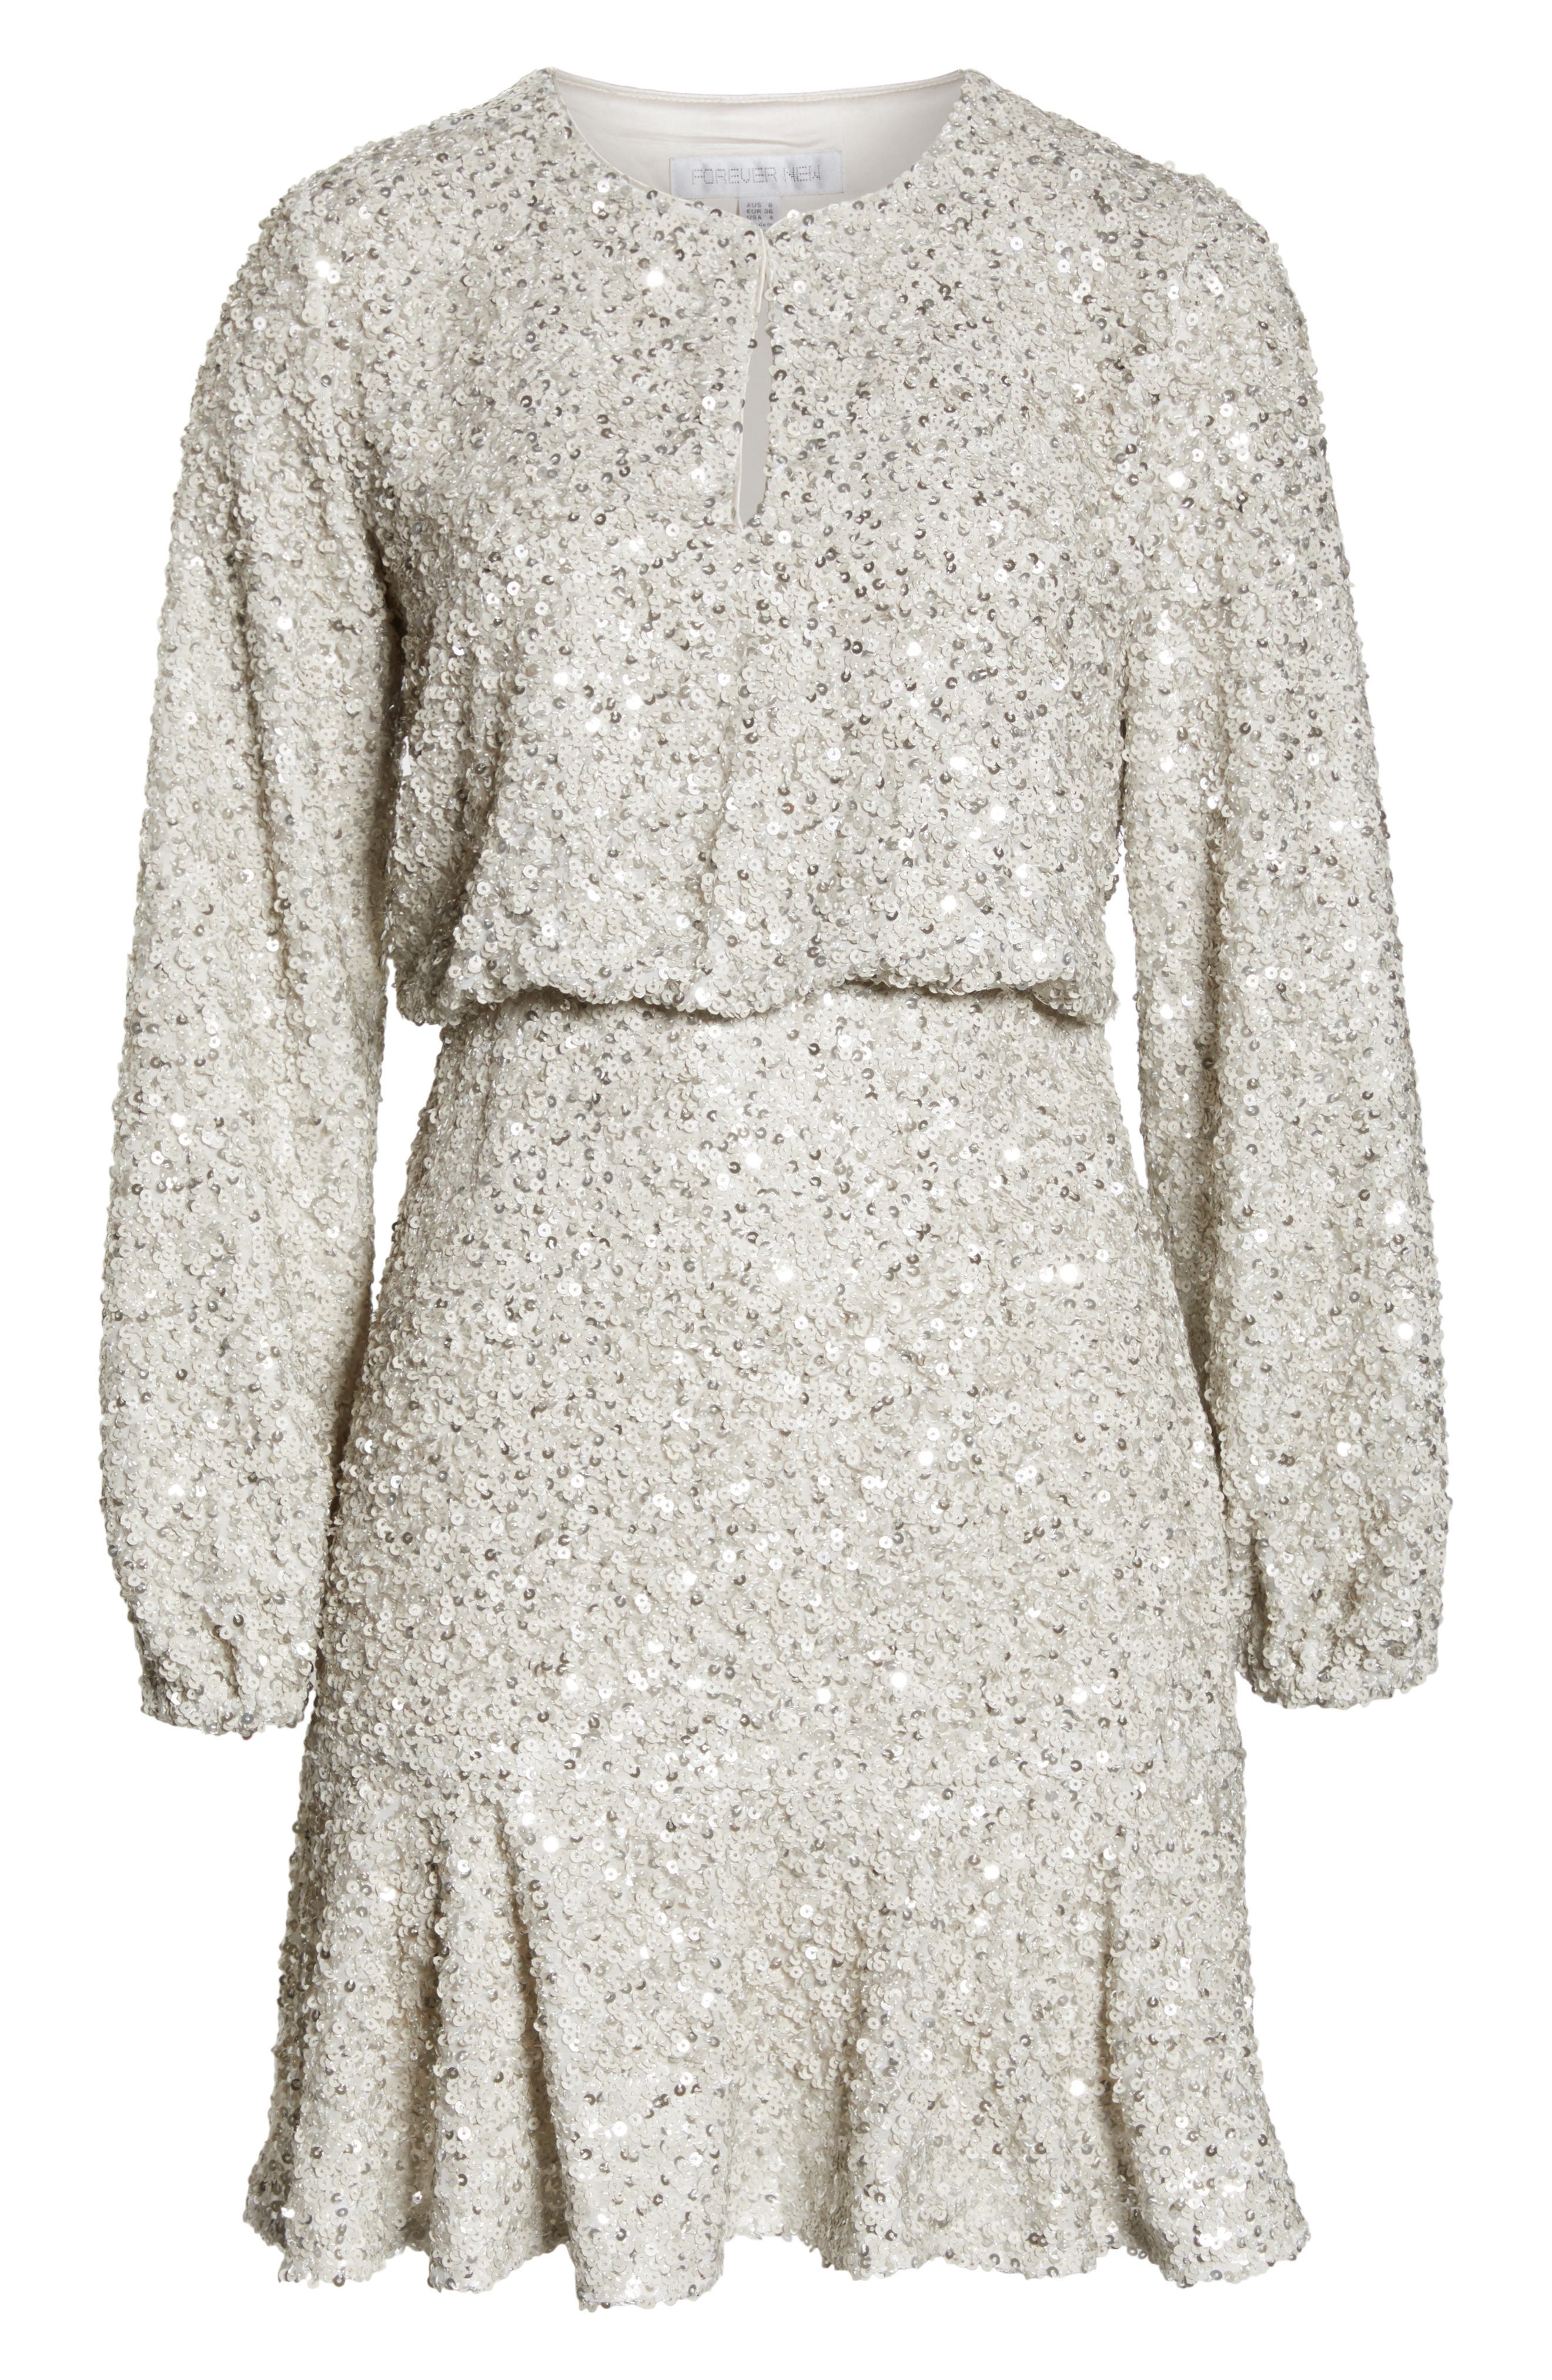 Sequin Ruffle Hem Dress,                             Alternate thumbnail 7, color,                             SILVER